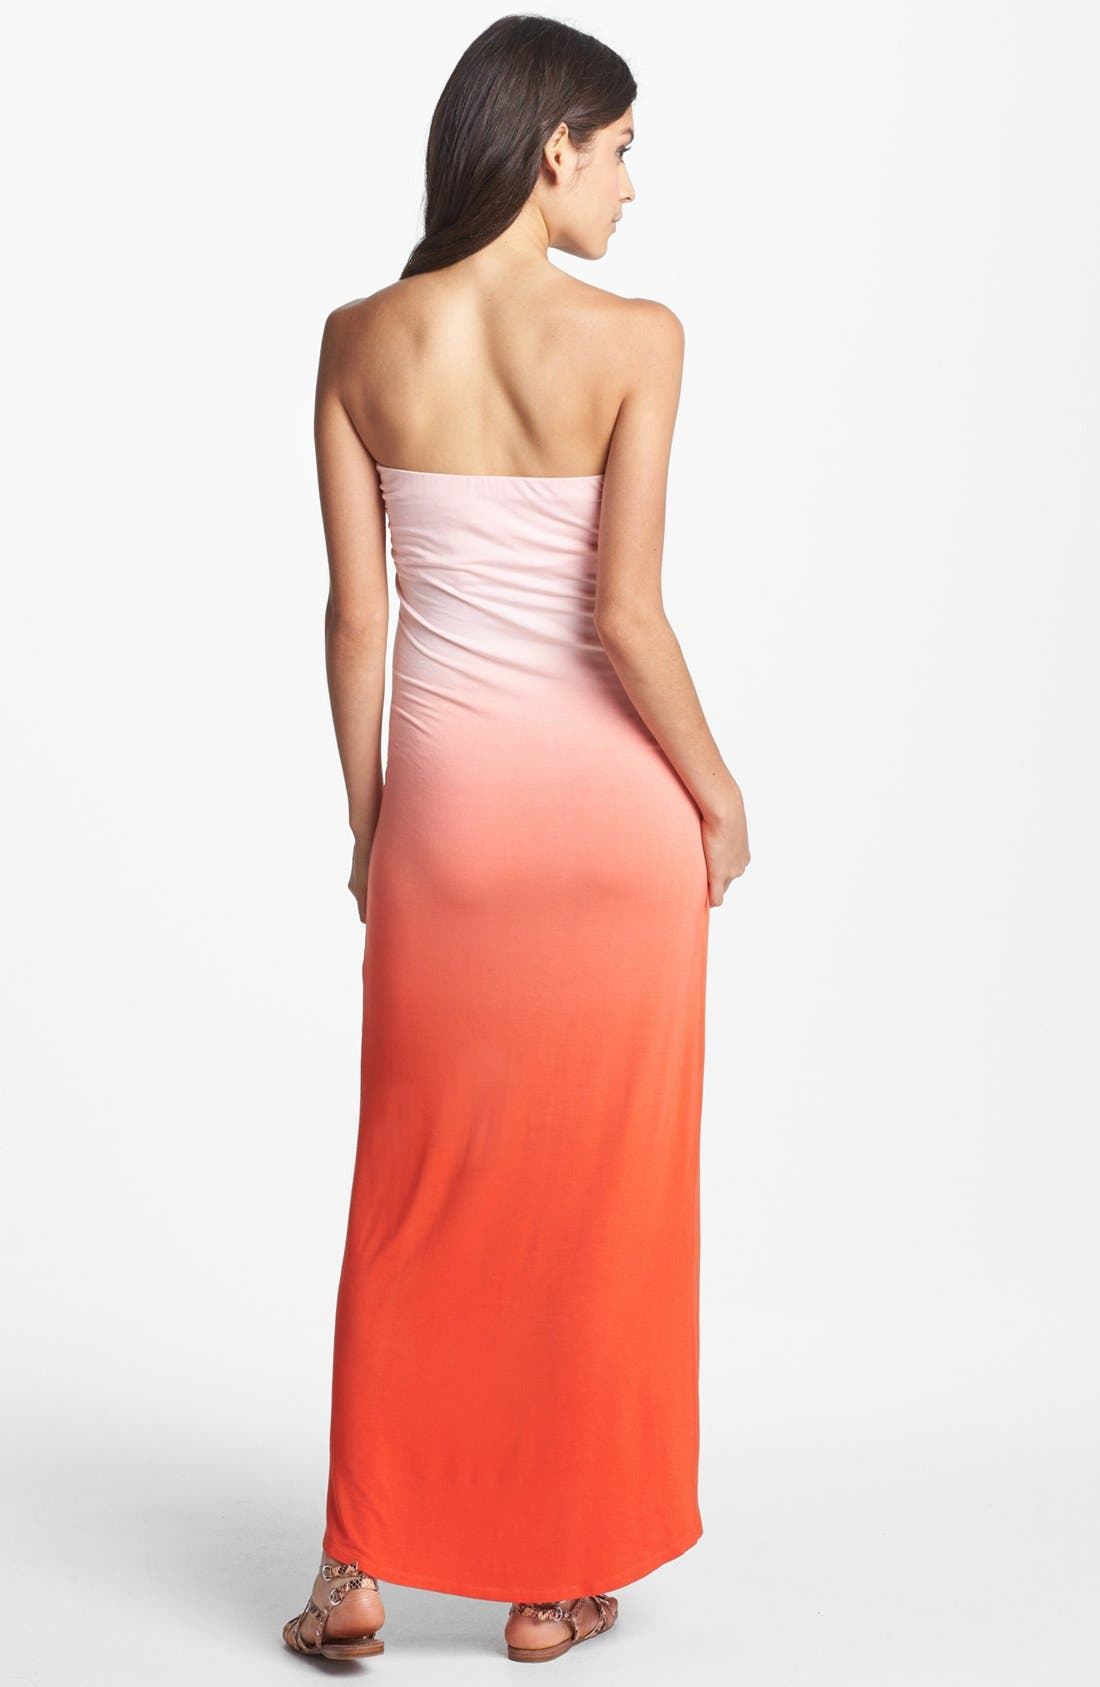 Alternate Image 2  - Young, Fabulous & Broke 'Brooklyn' Ombré Maxi Dress